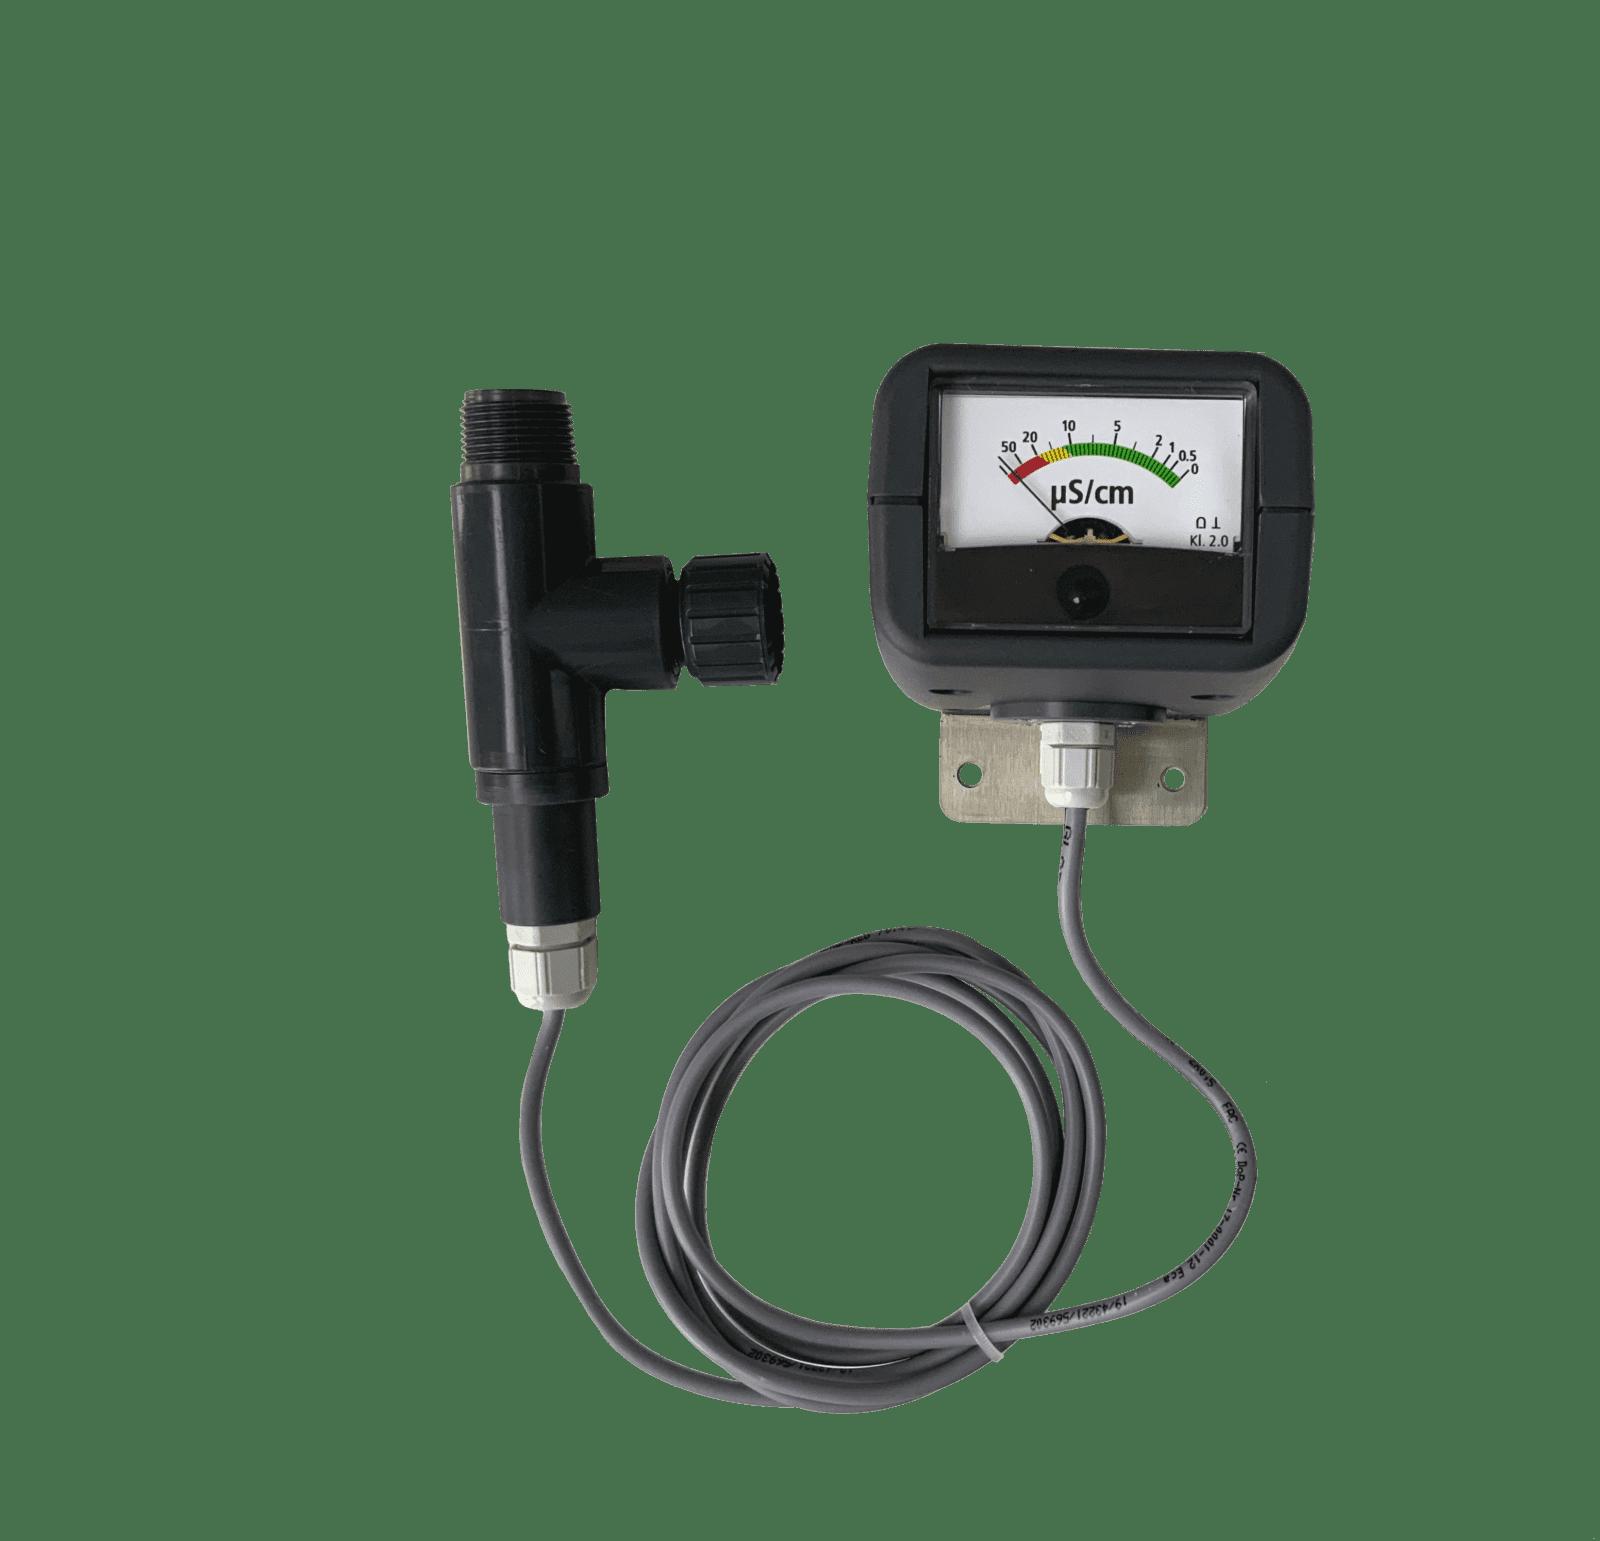 Aquafilter Pro Leitwertmessgerät AW 100